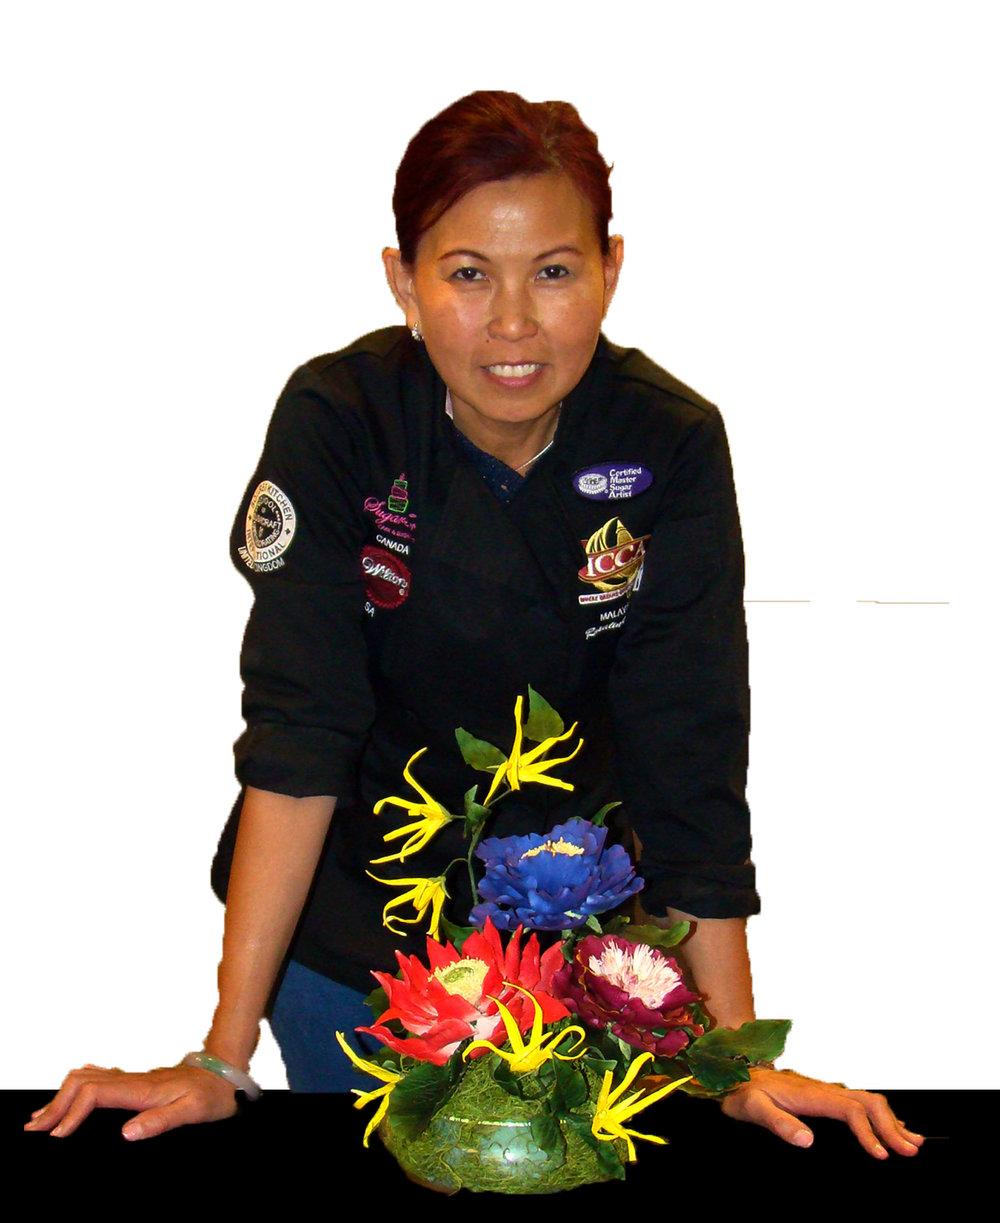 Rosalind Chan